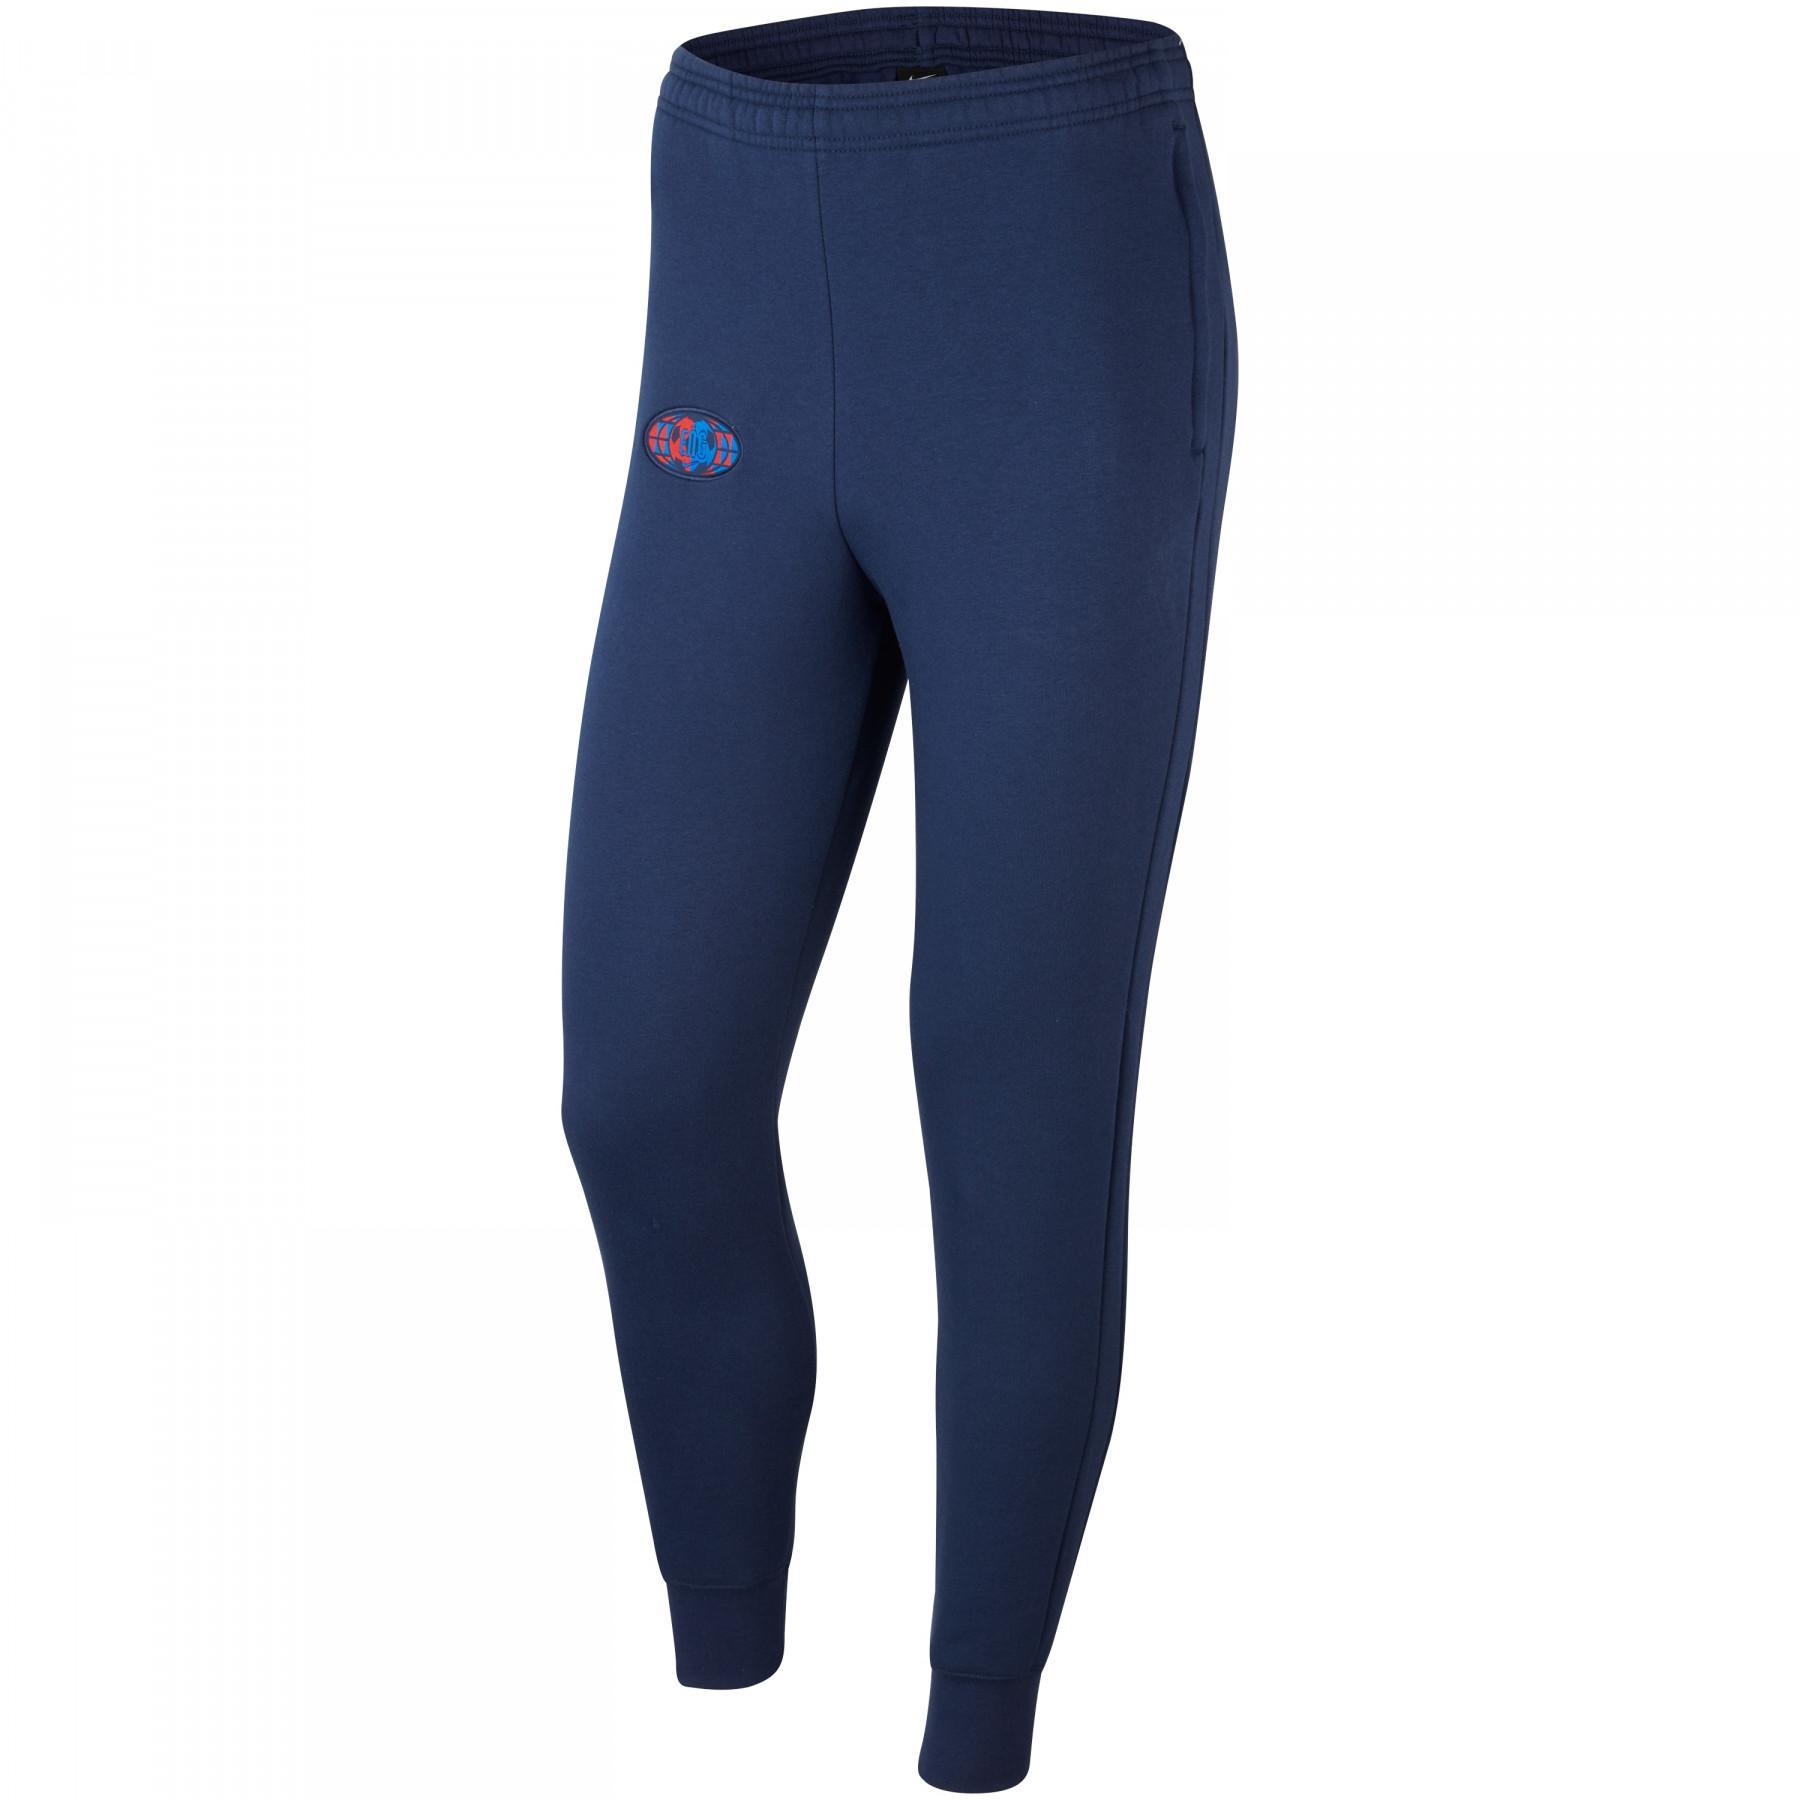 England Training Pants